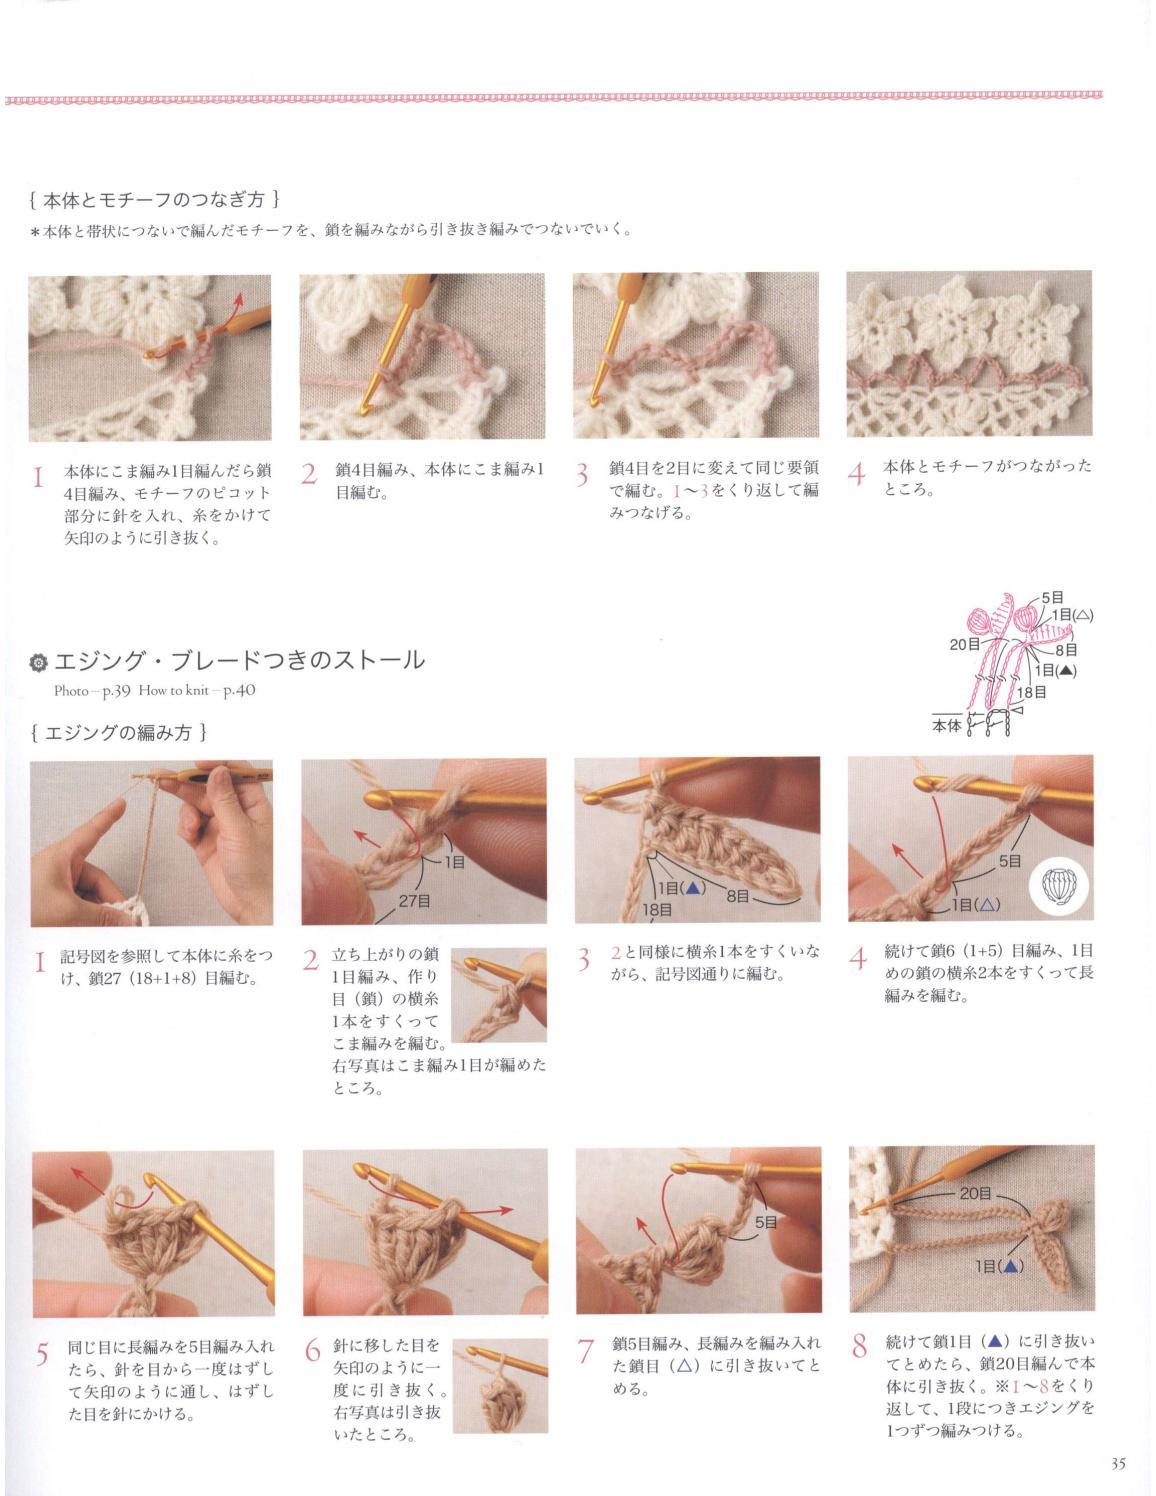 Asahi original crochet best selection 2012 page 35